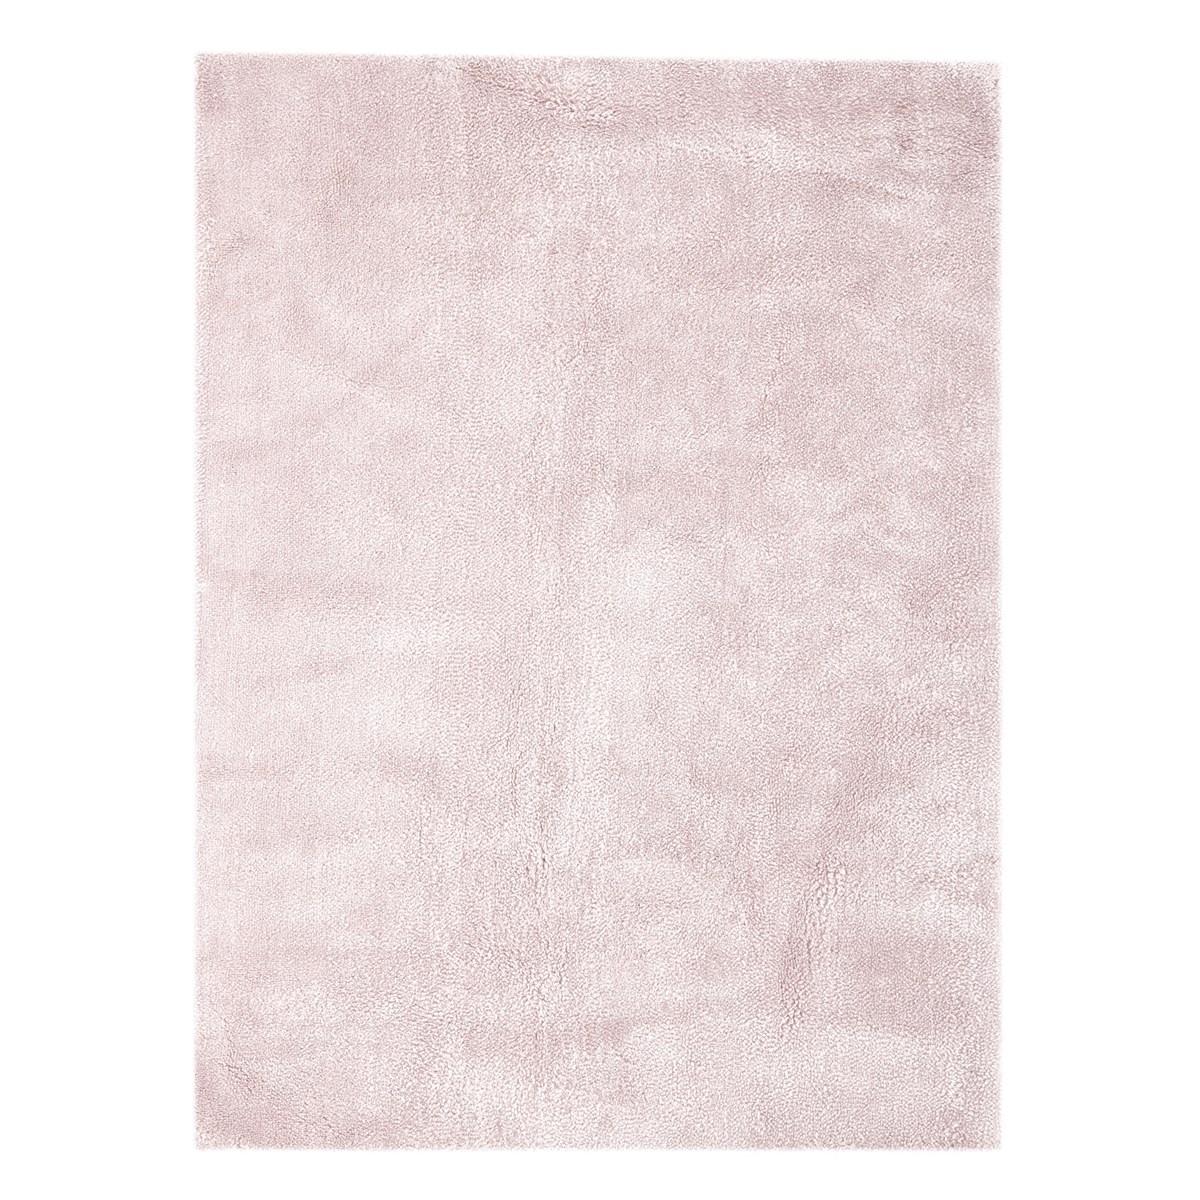 Tapis shaggy en Polyester Rose 160x230 cm